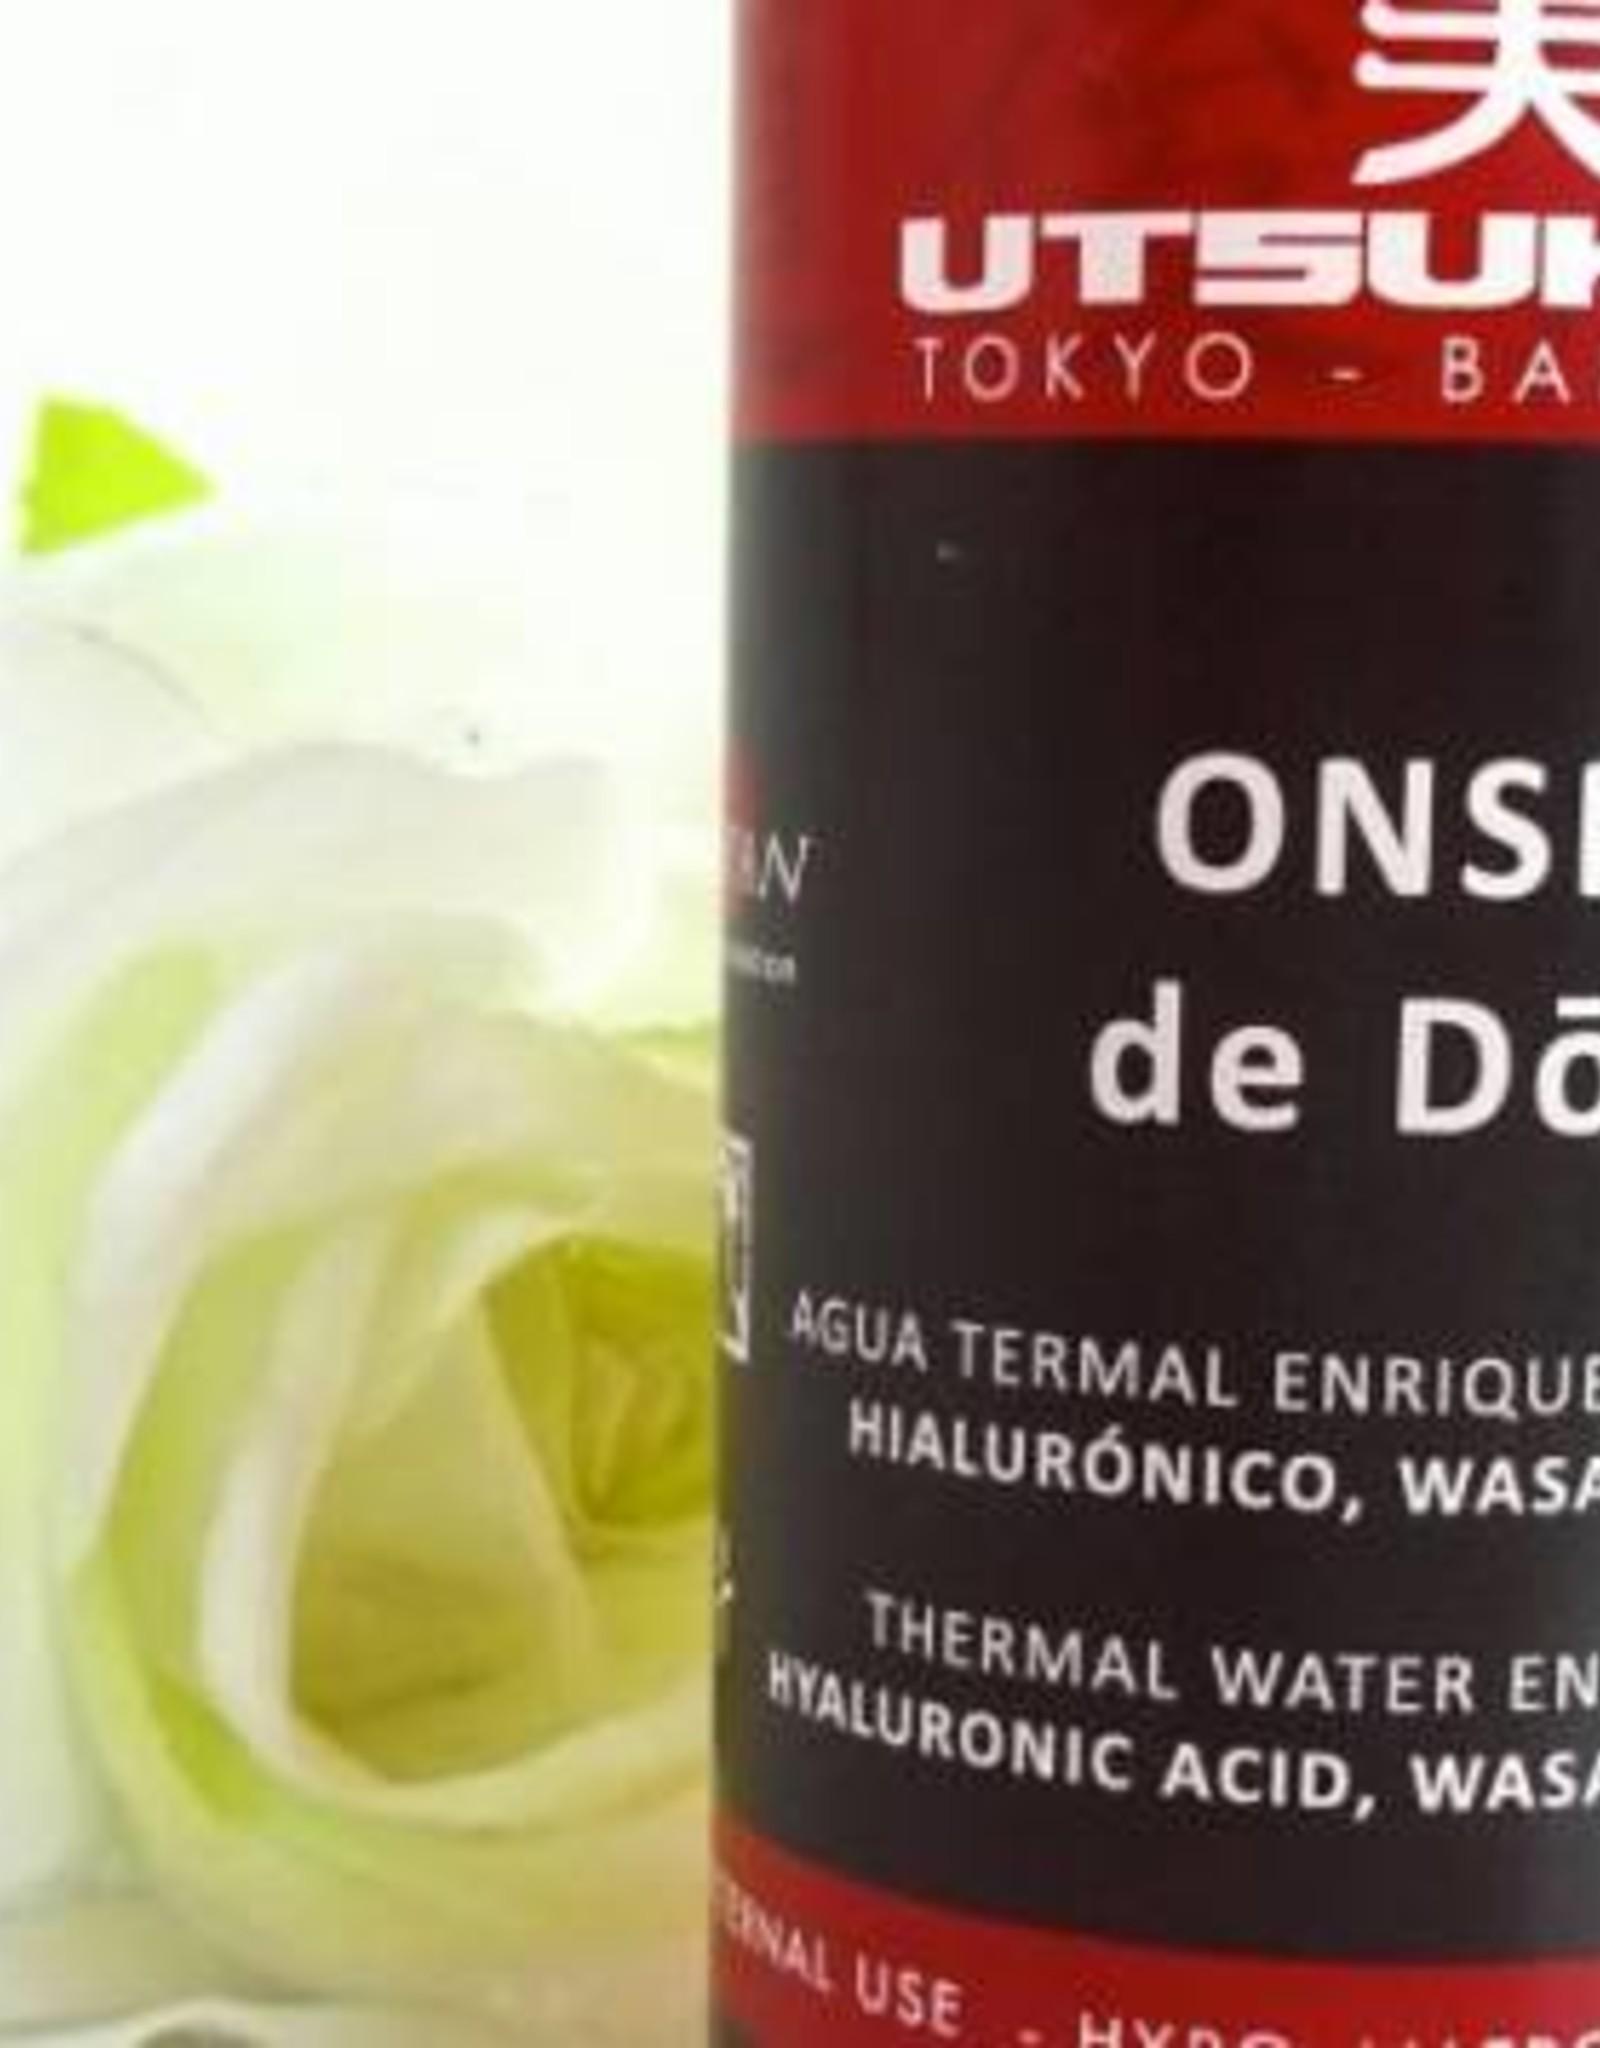 Utsukusy Shashimi Onsen de Dogo thermaal water